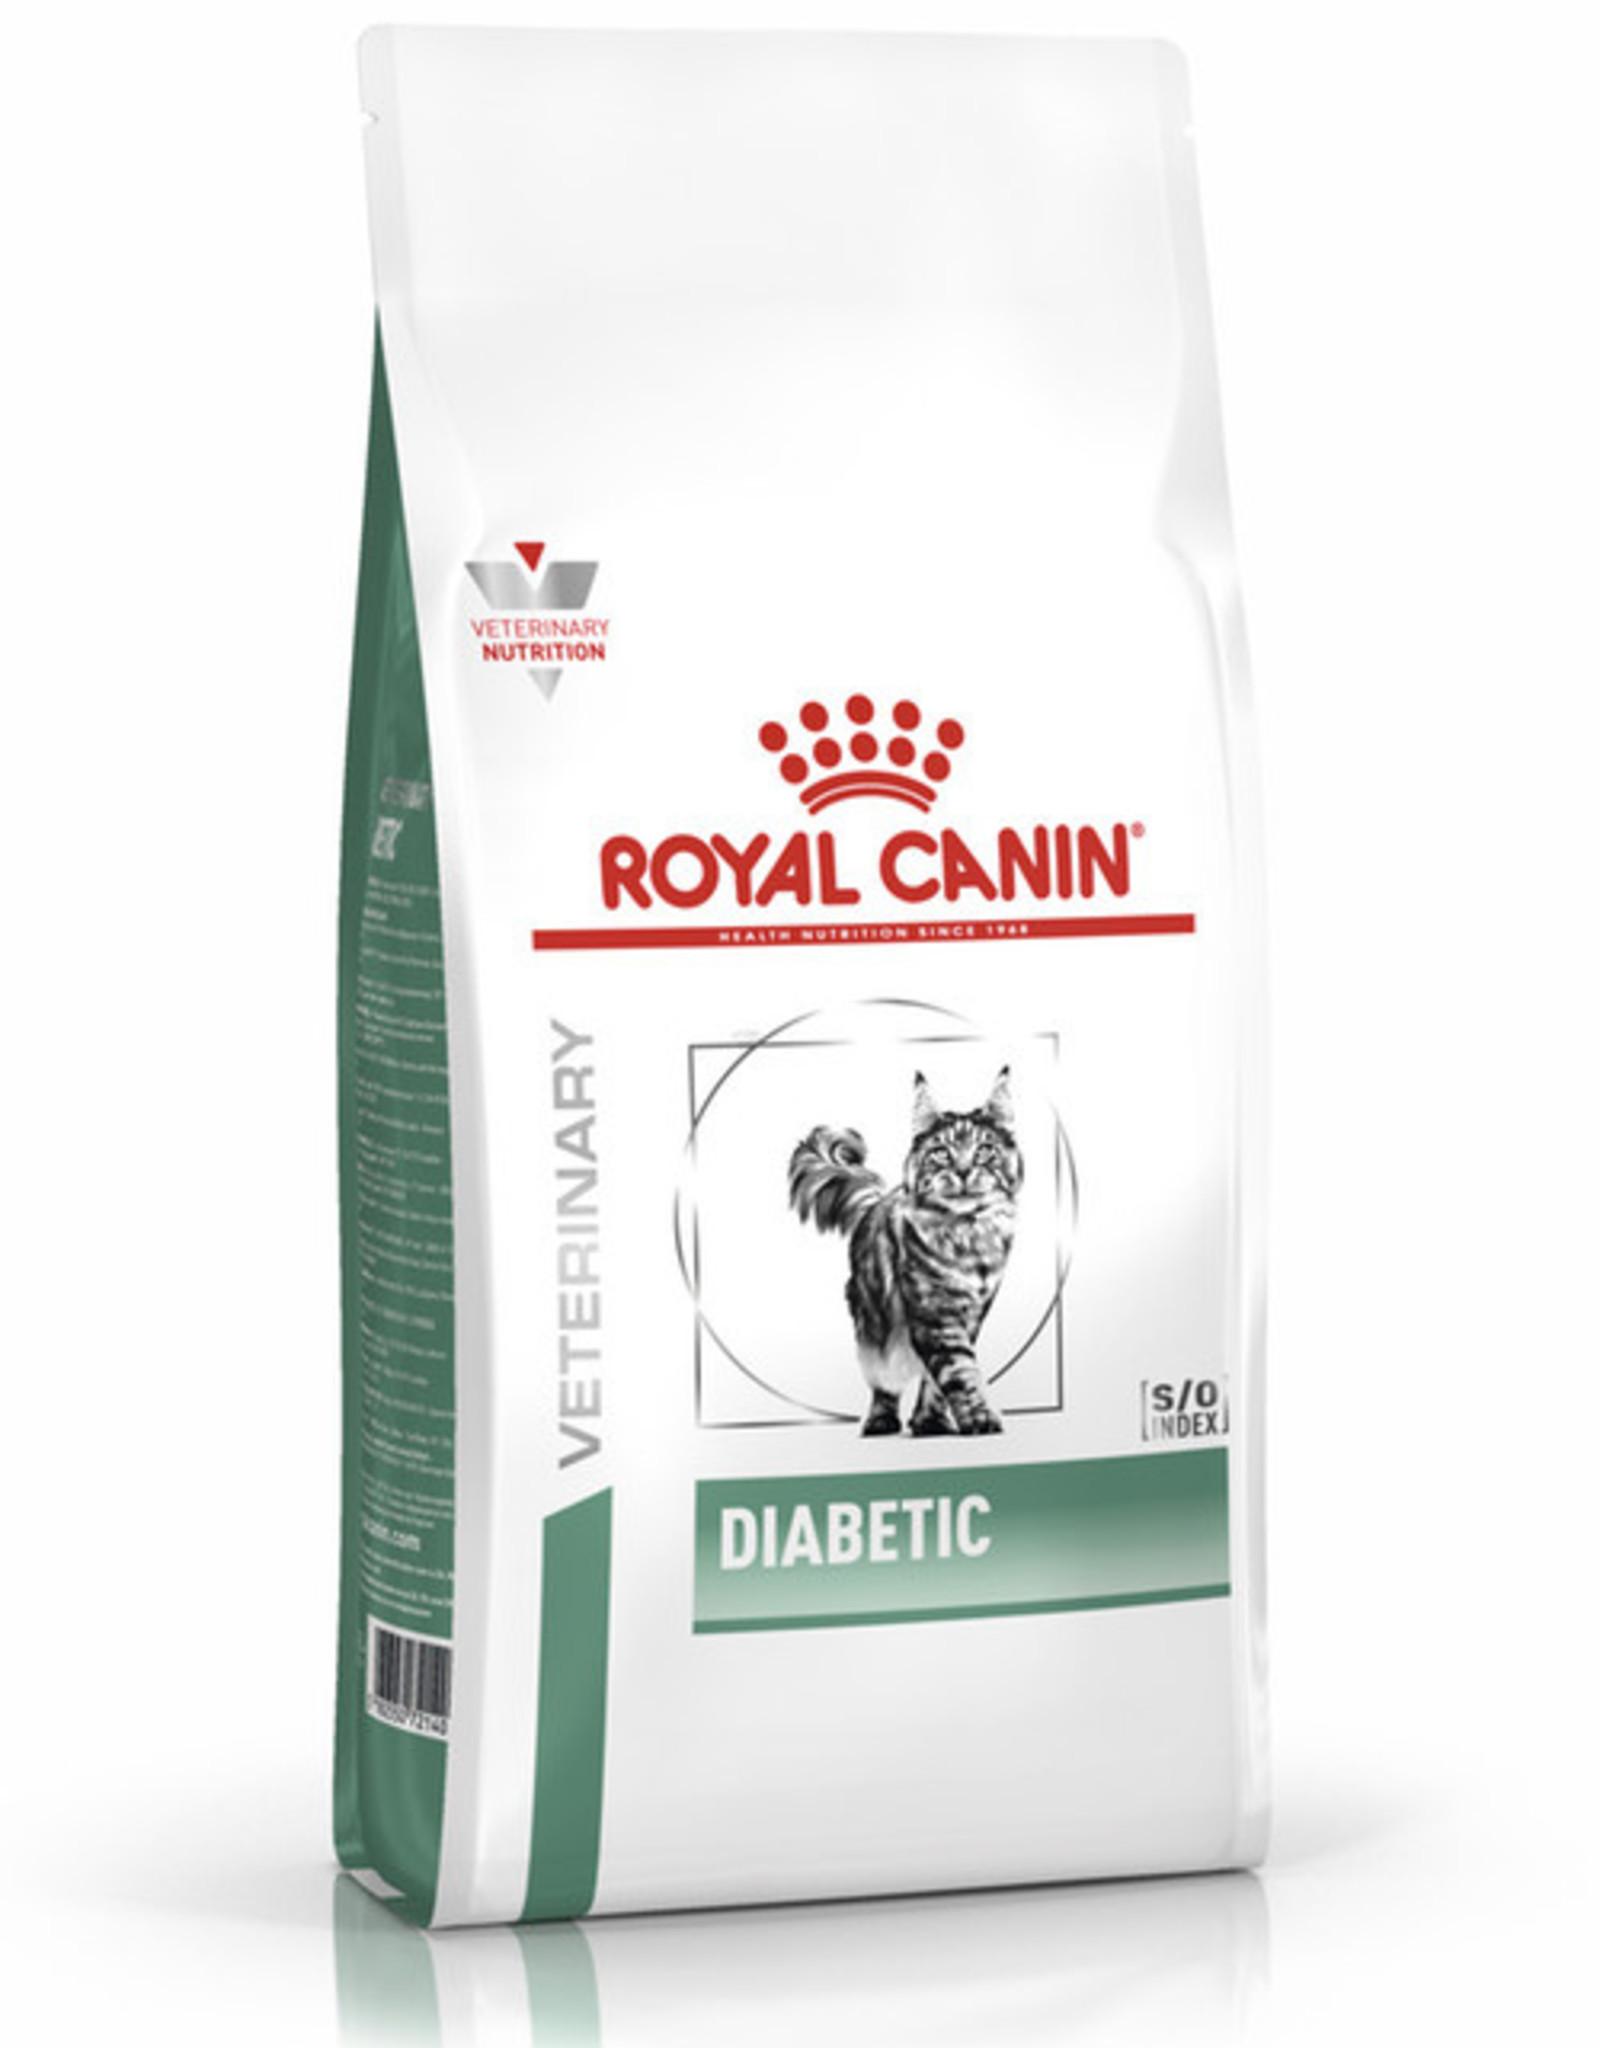 Royal Canin Royal Canin Vdiet Diabetic Feline 3,5kg